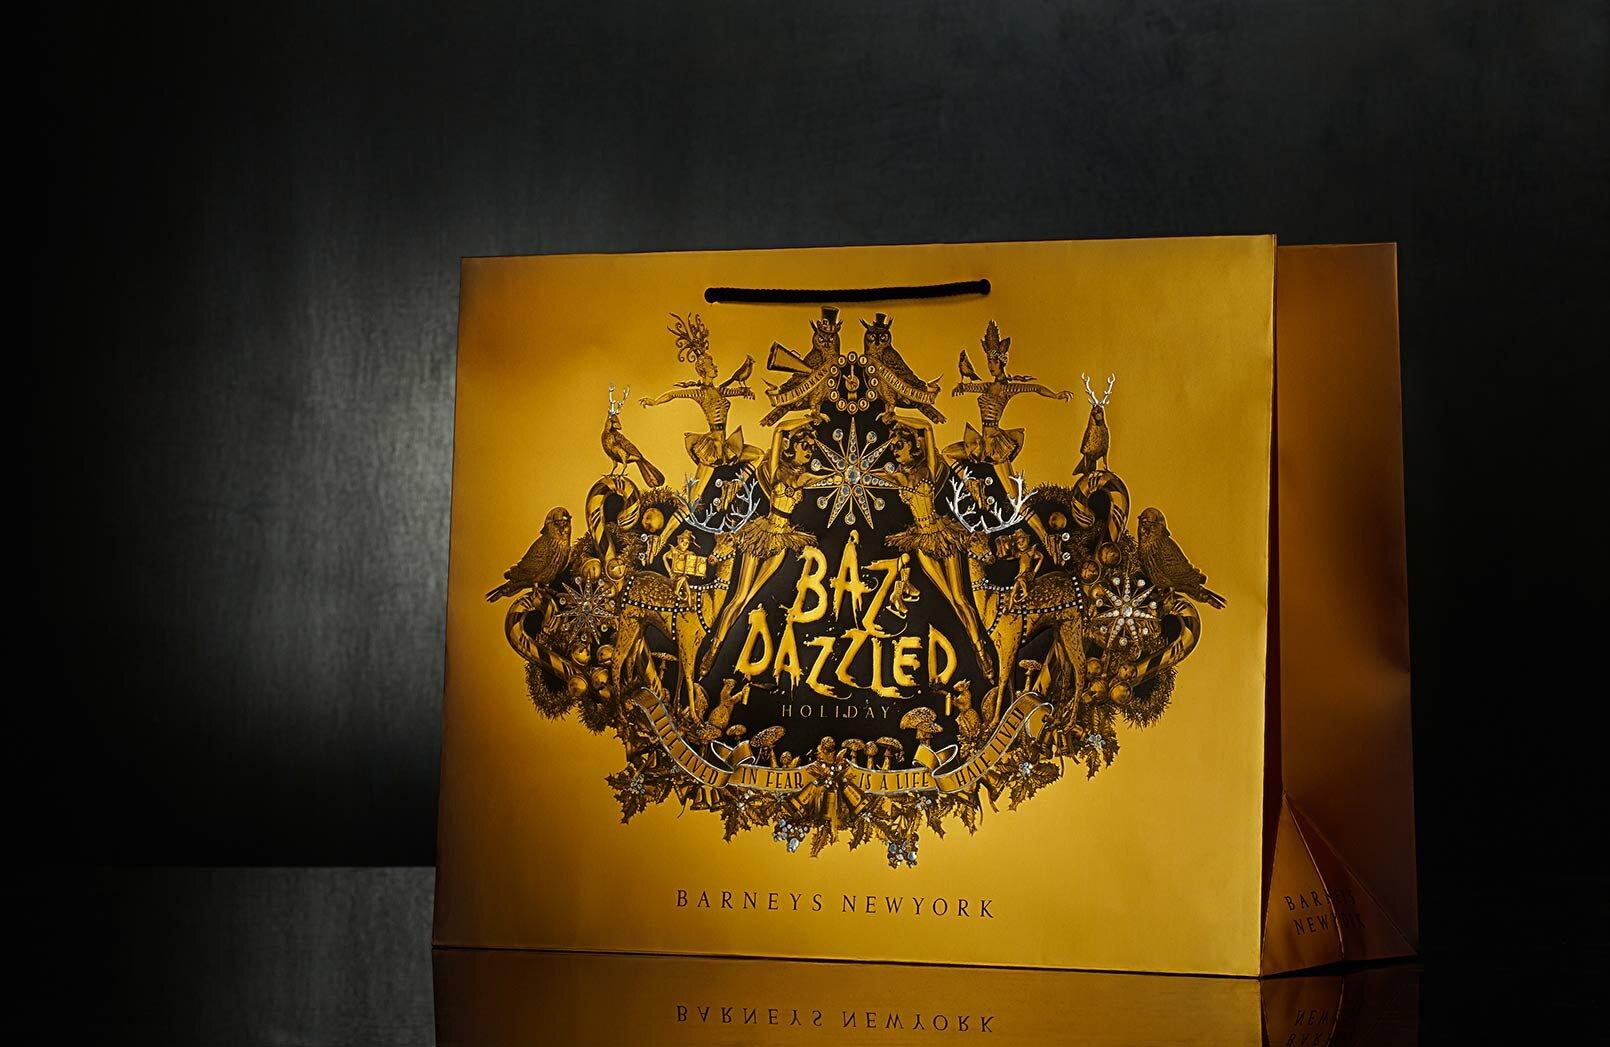 Barneys-New-York-Holiday-Jayz-Design-Packaging-Company-1.1.jpg